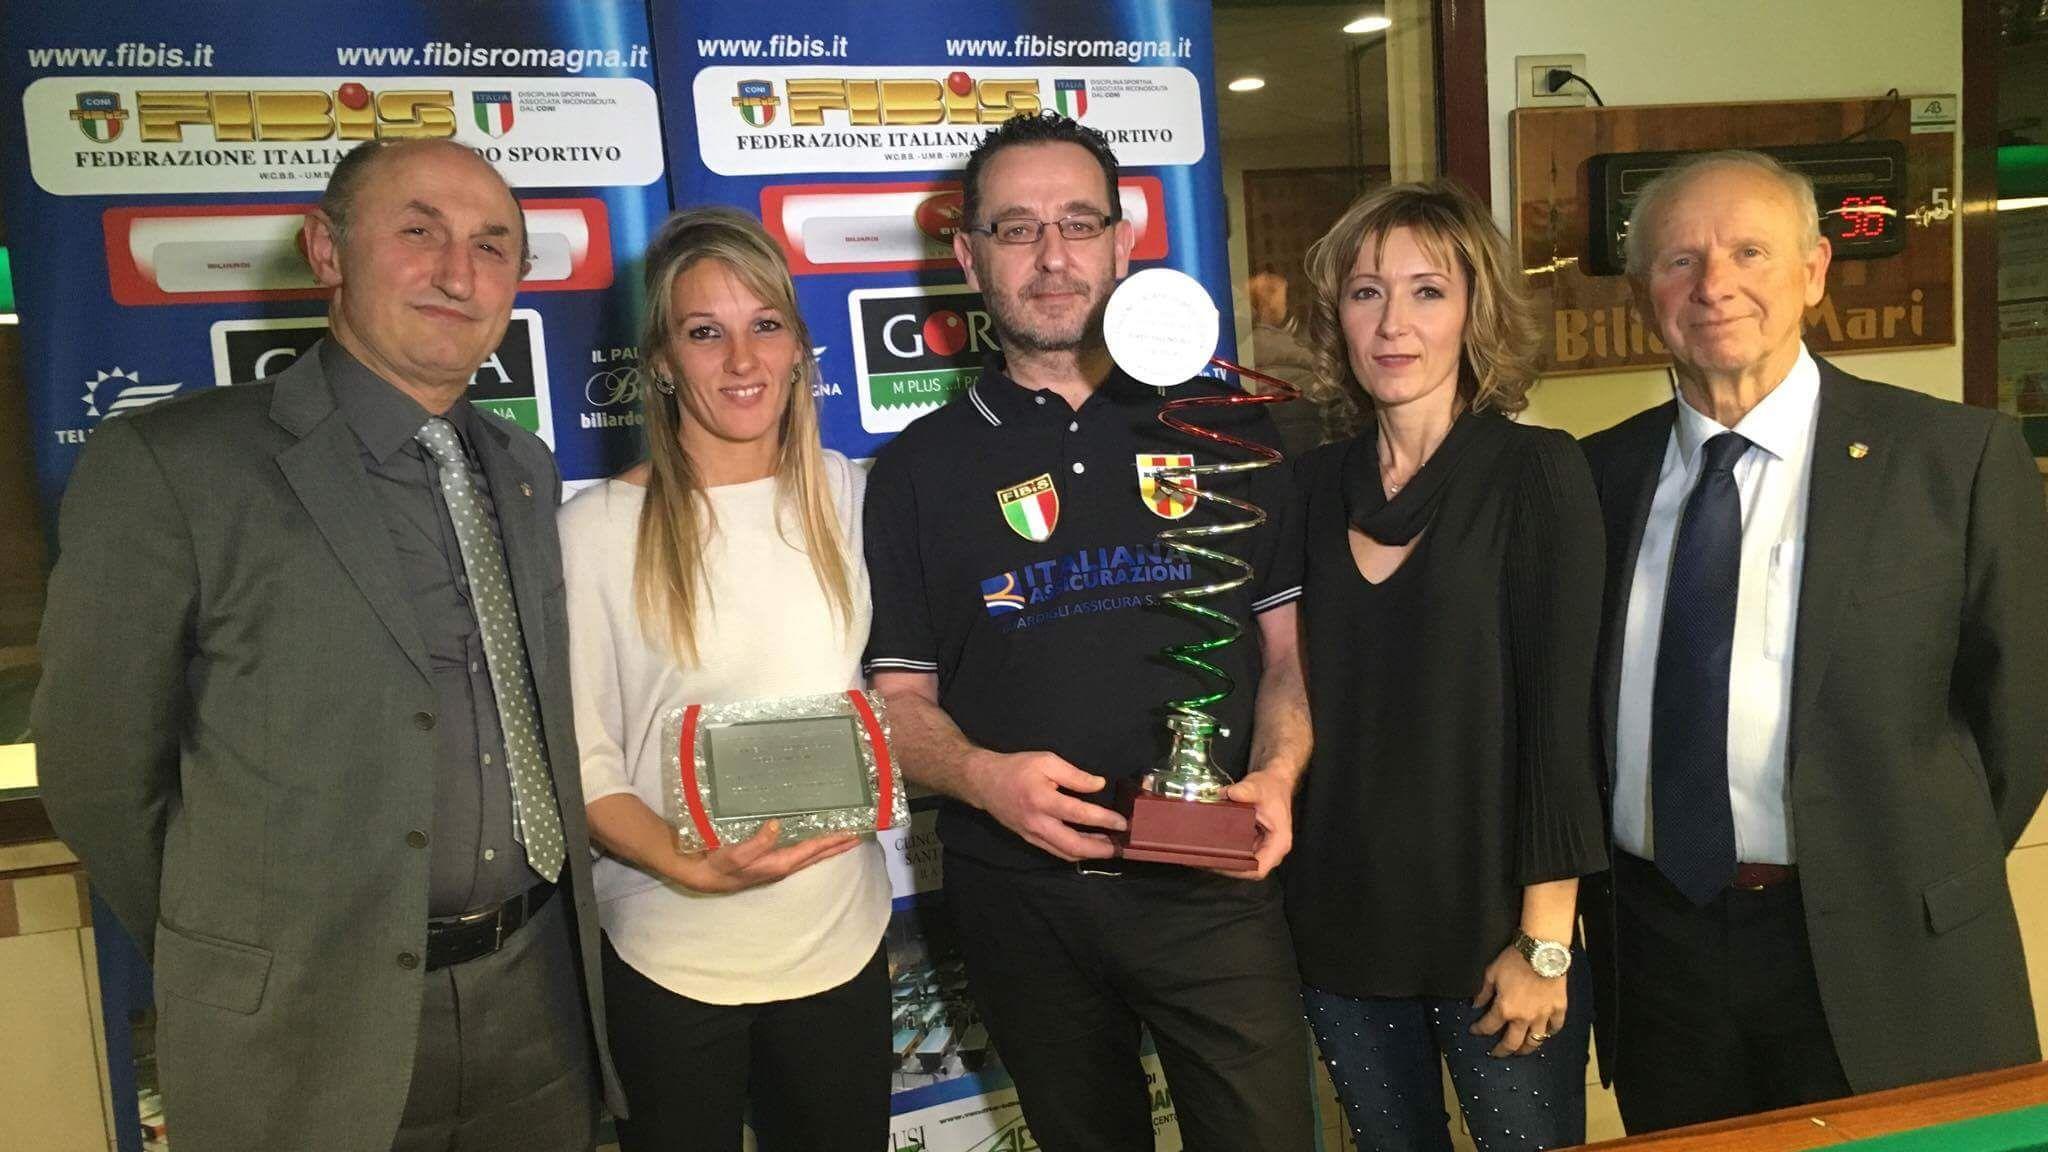 Loris De Cesari, Sara Samori'(Assessore Sport Forlì), Iuri Minoccheri, Stefania Ceccarelli, Luciano Naldi (Pres. Fibis Forlì-Cesena)